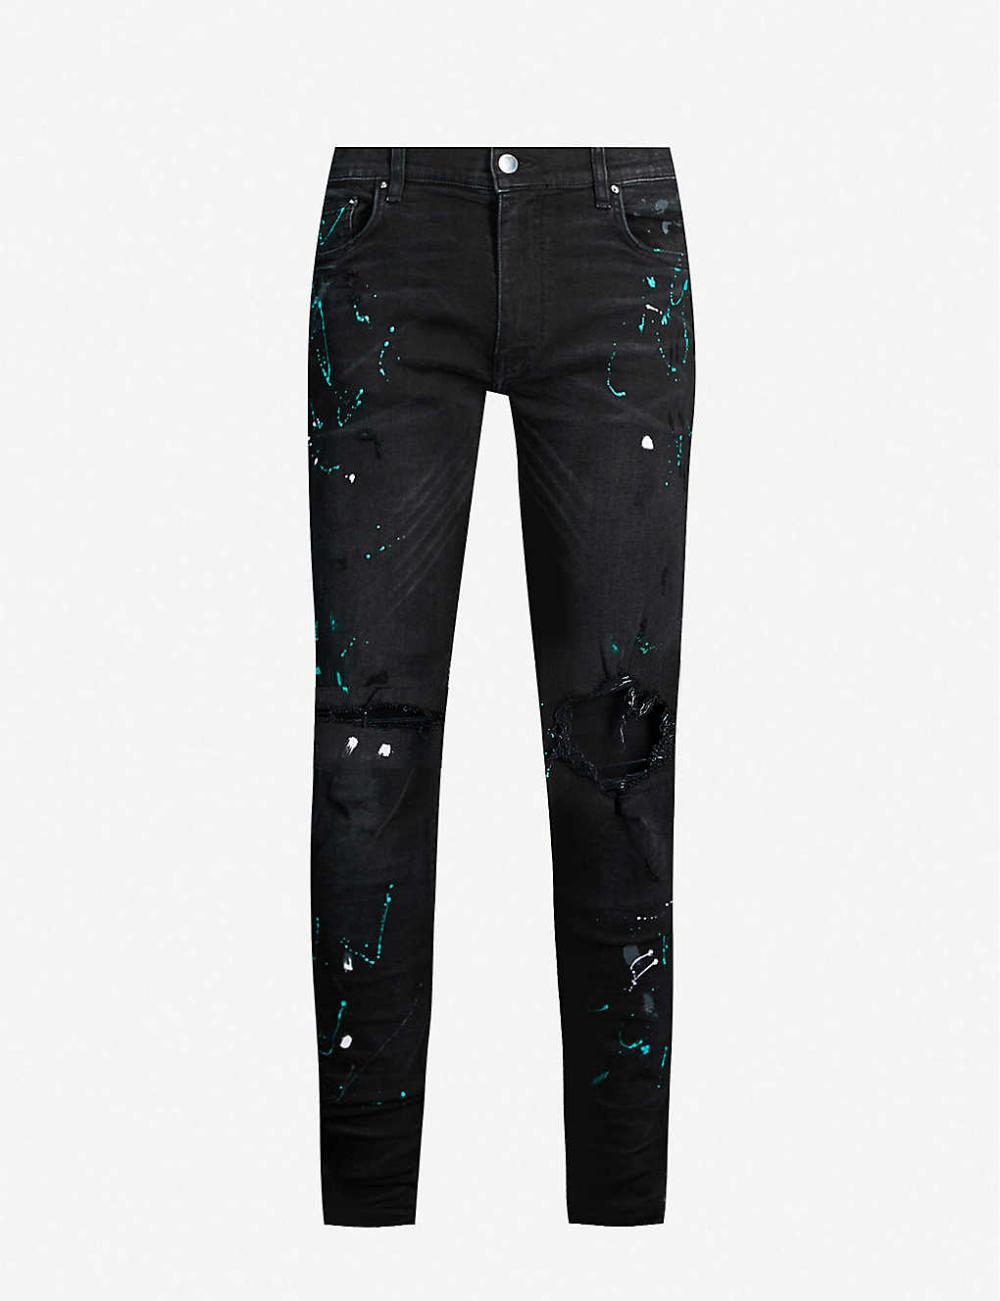 AMIRI Paint splattered skinny jeans   Skinny jeans, Fashion, Jeans